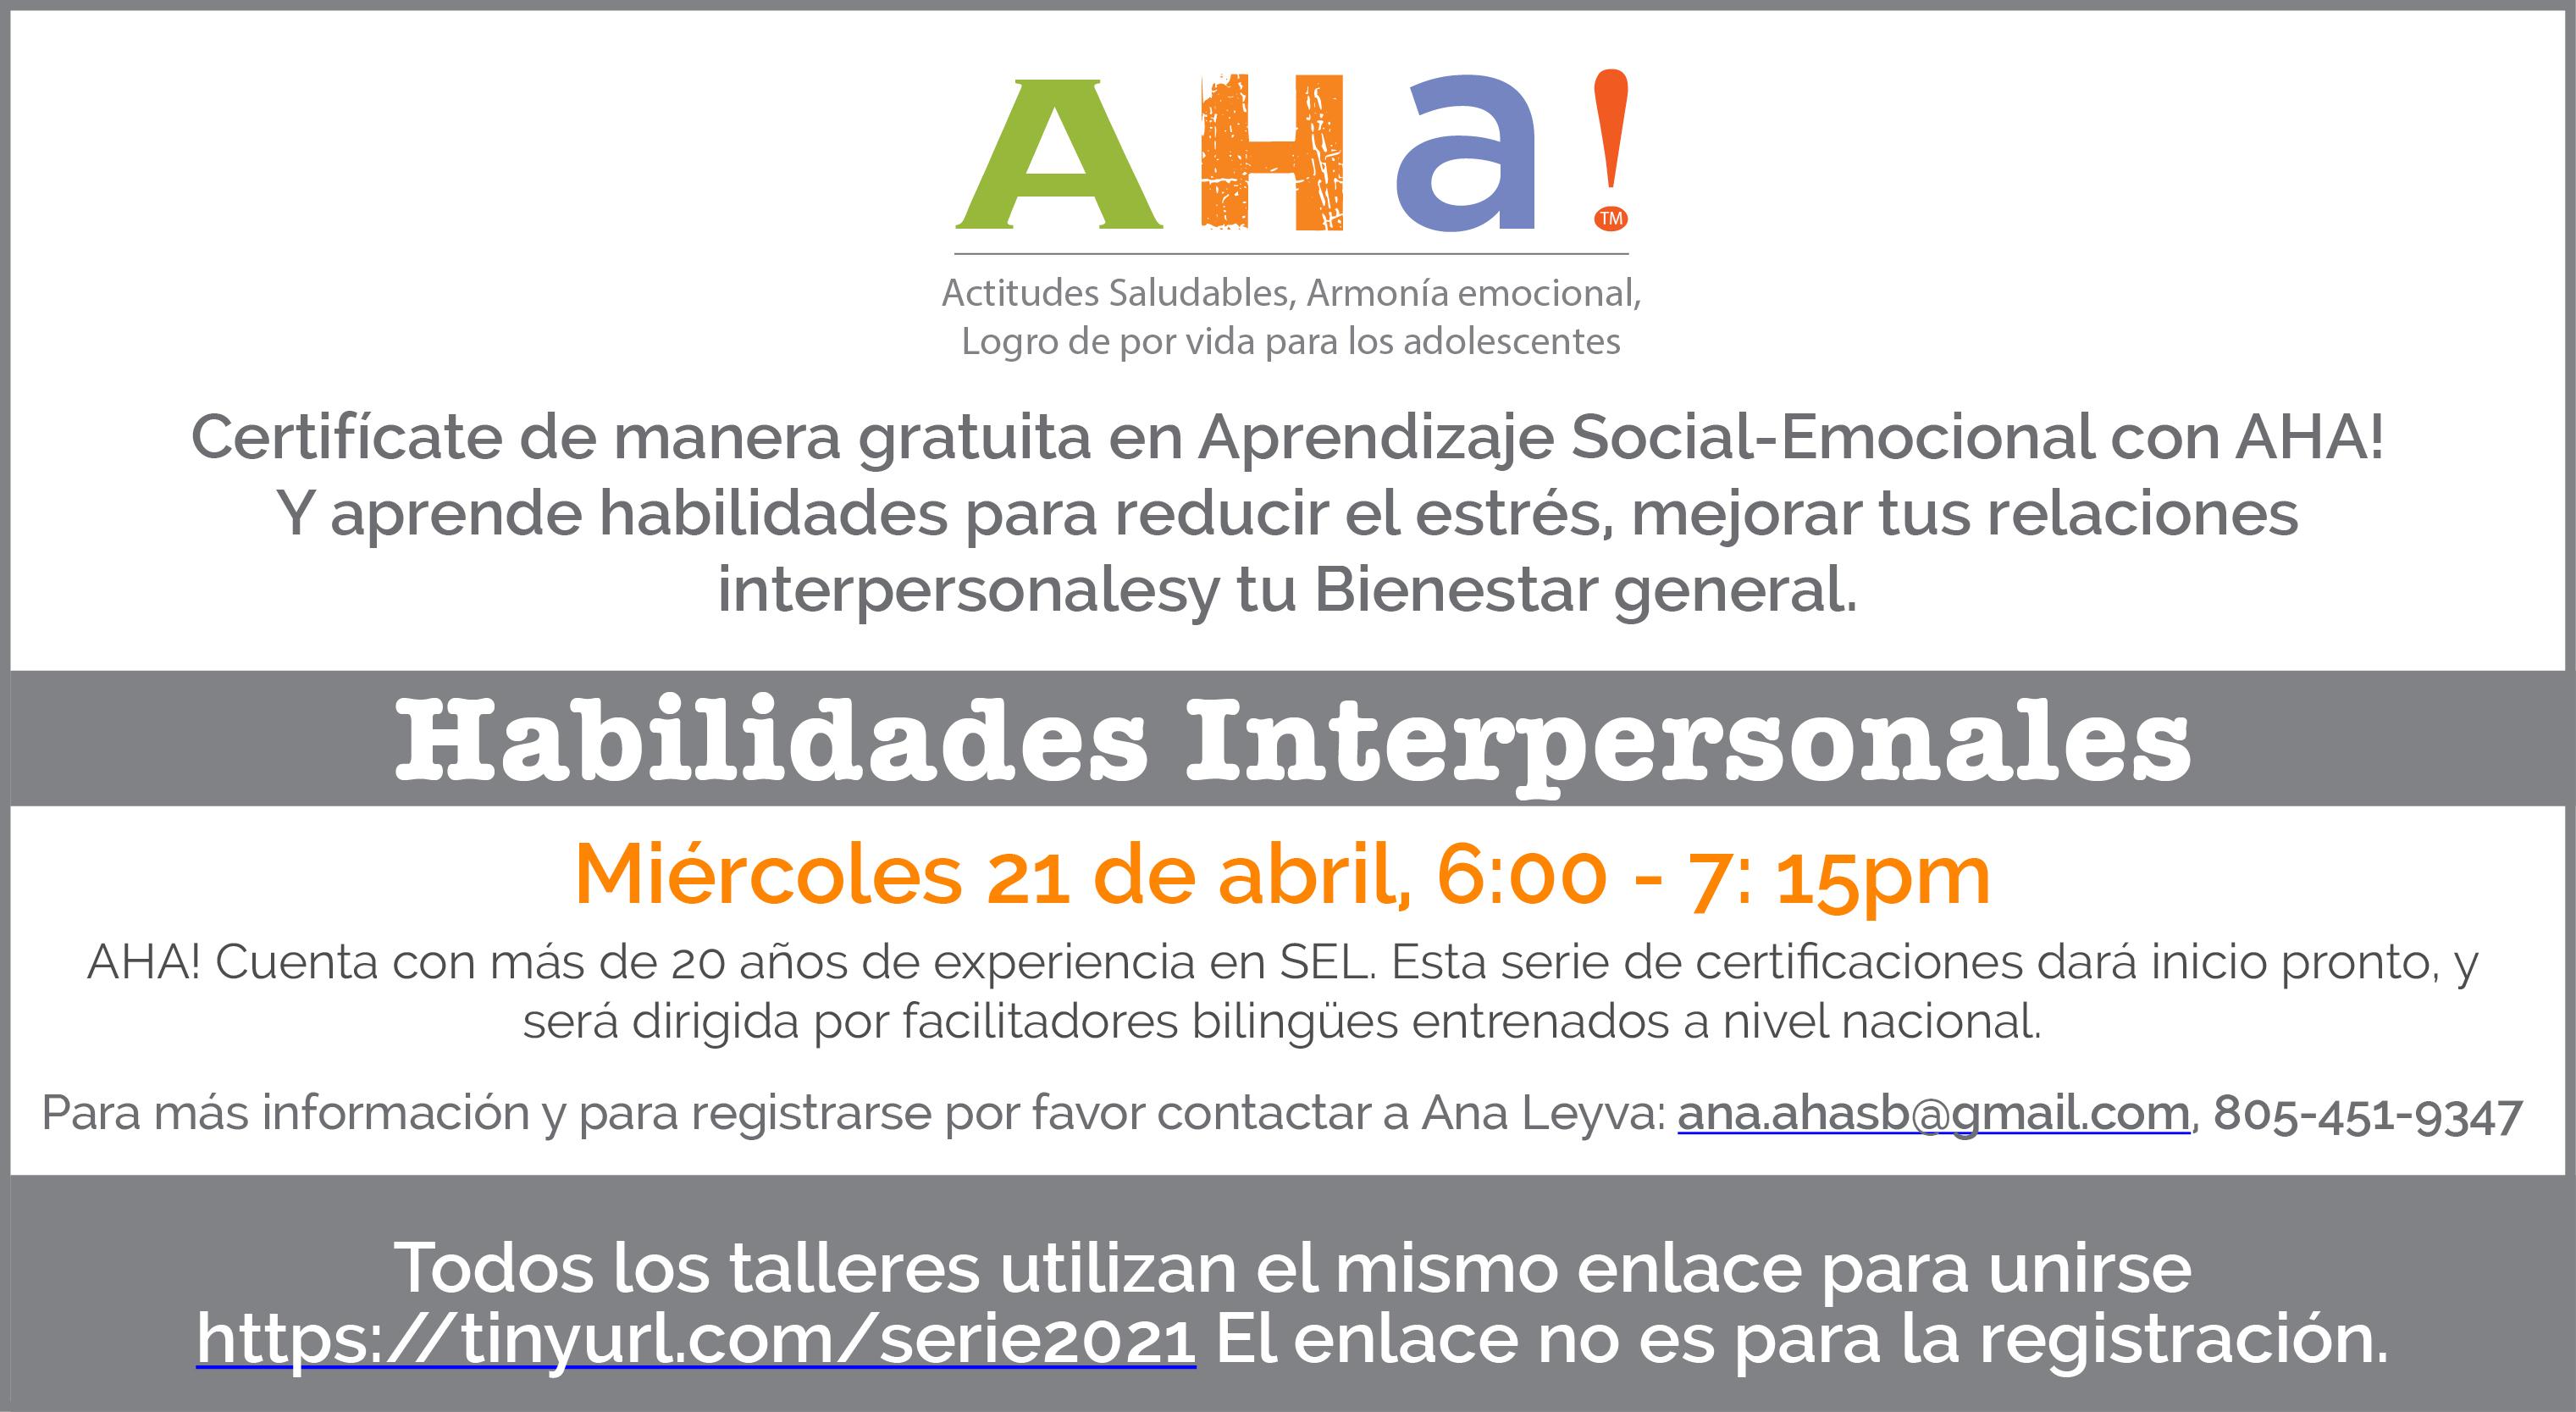 Programas Gratuitos de Certificación de AHA! title=